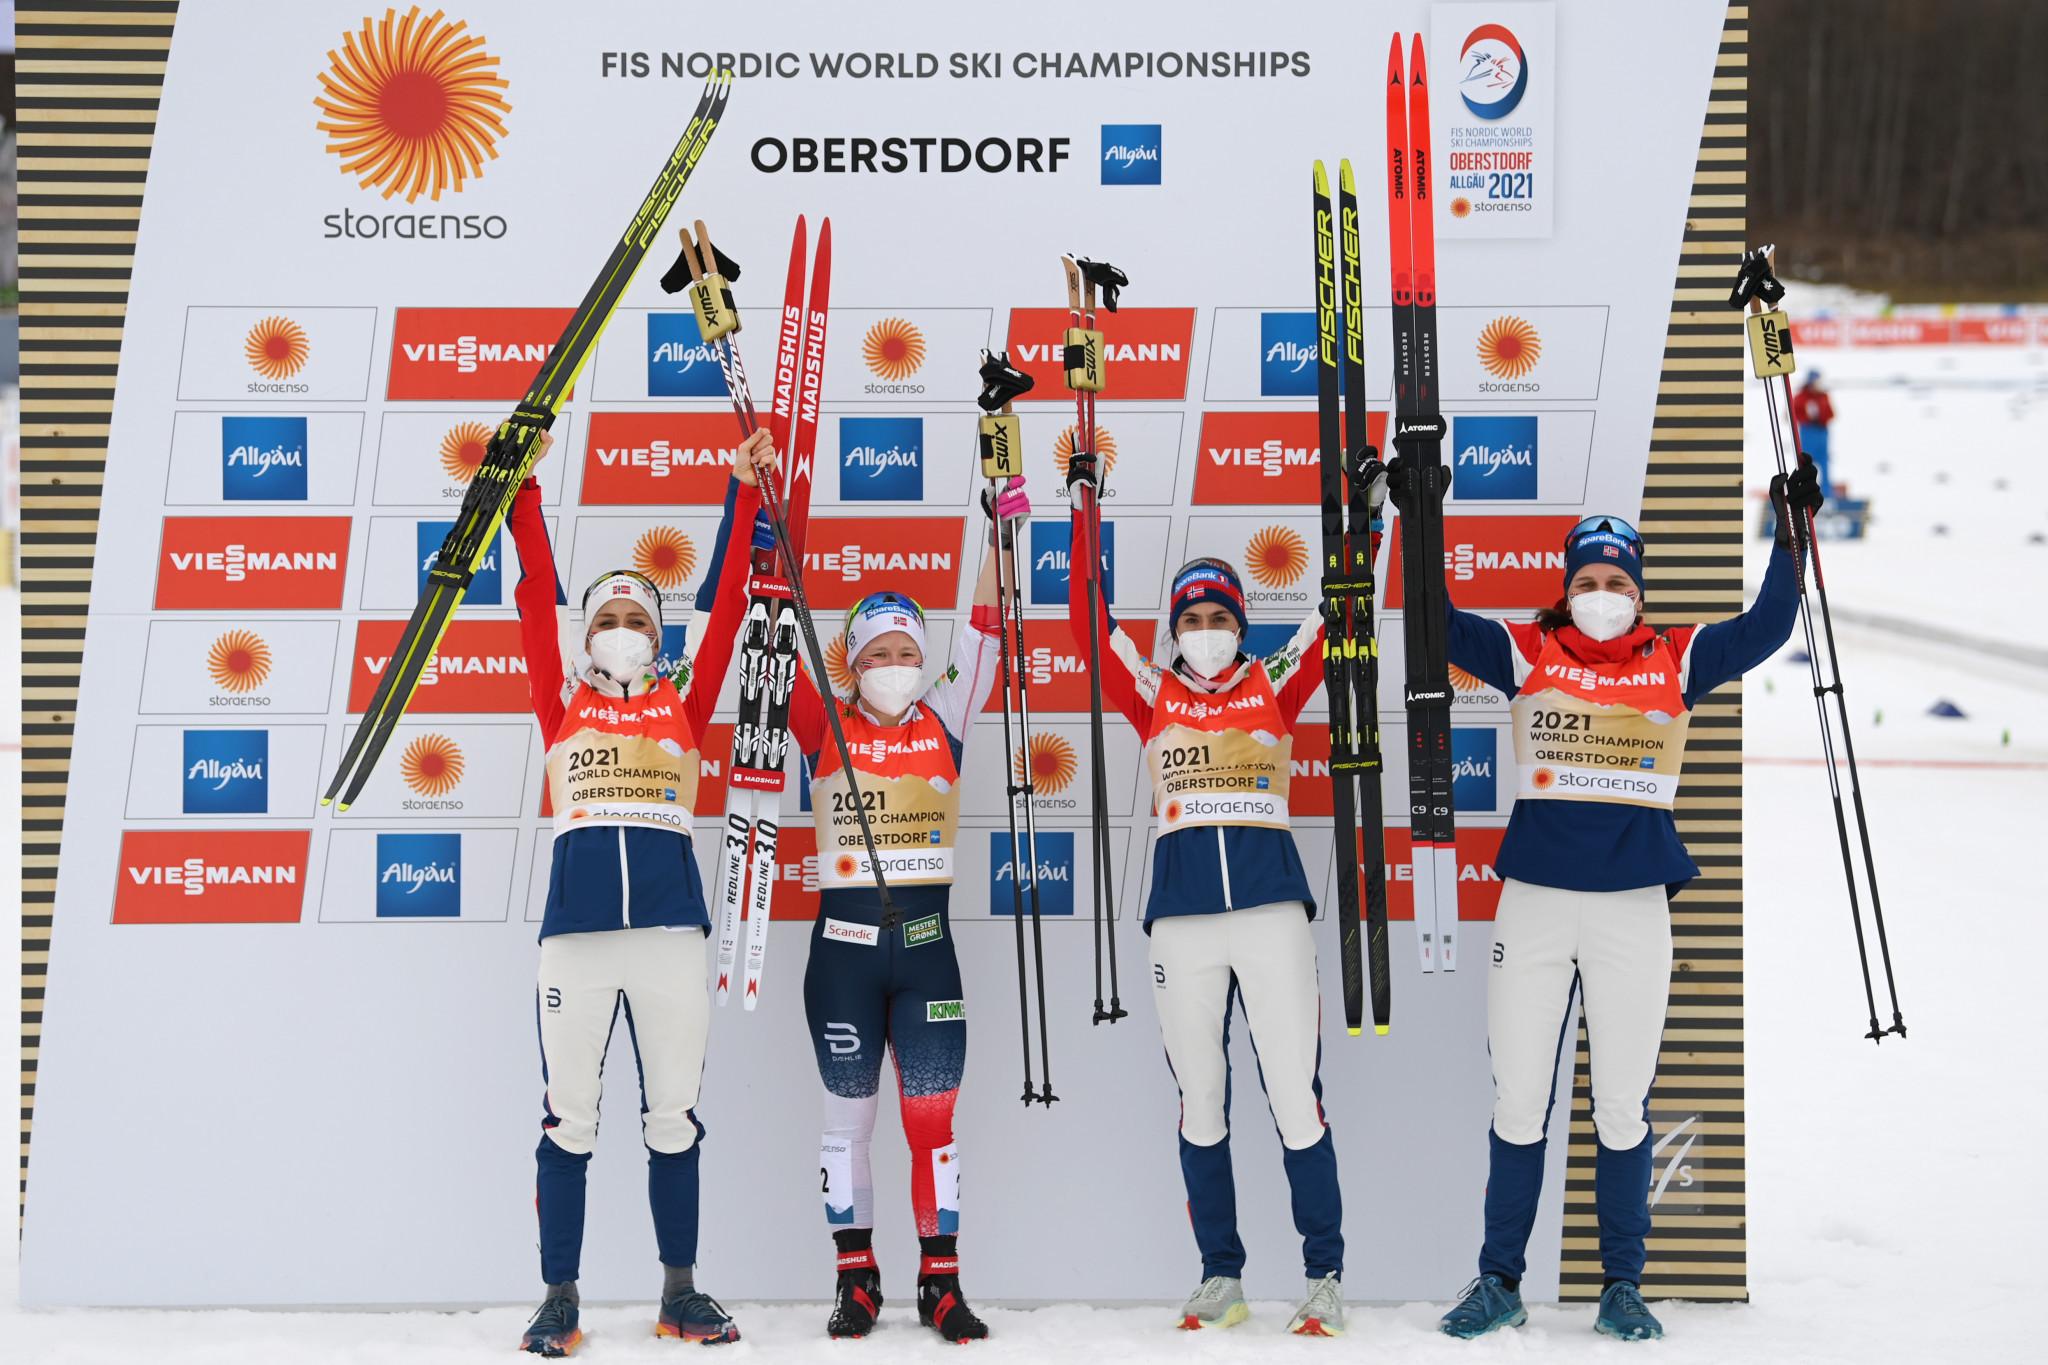 Norwegian quartet Tiril Udnes Weng, Heidi Weng, Therese Johaug and Helene Marie Fossesholm won the women's 4x5km relay ©Getty Images